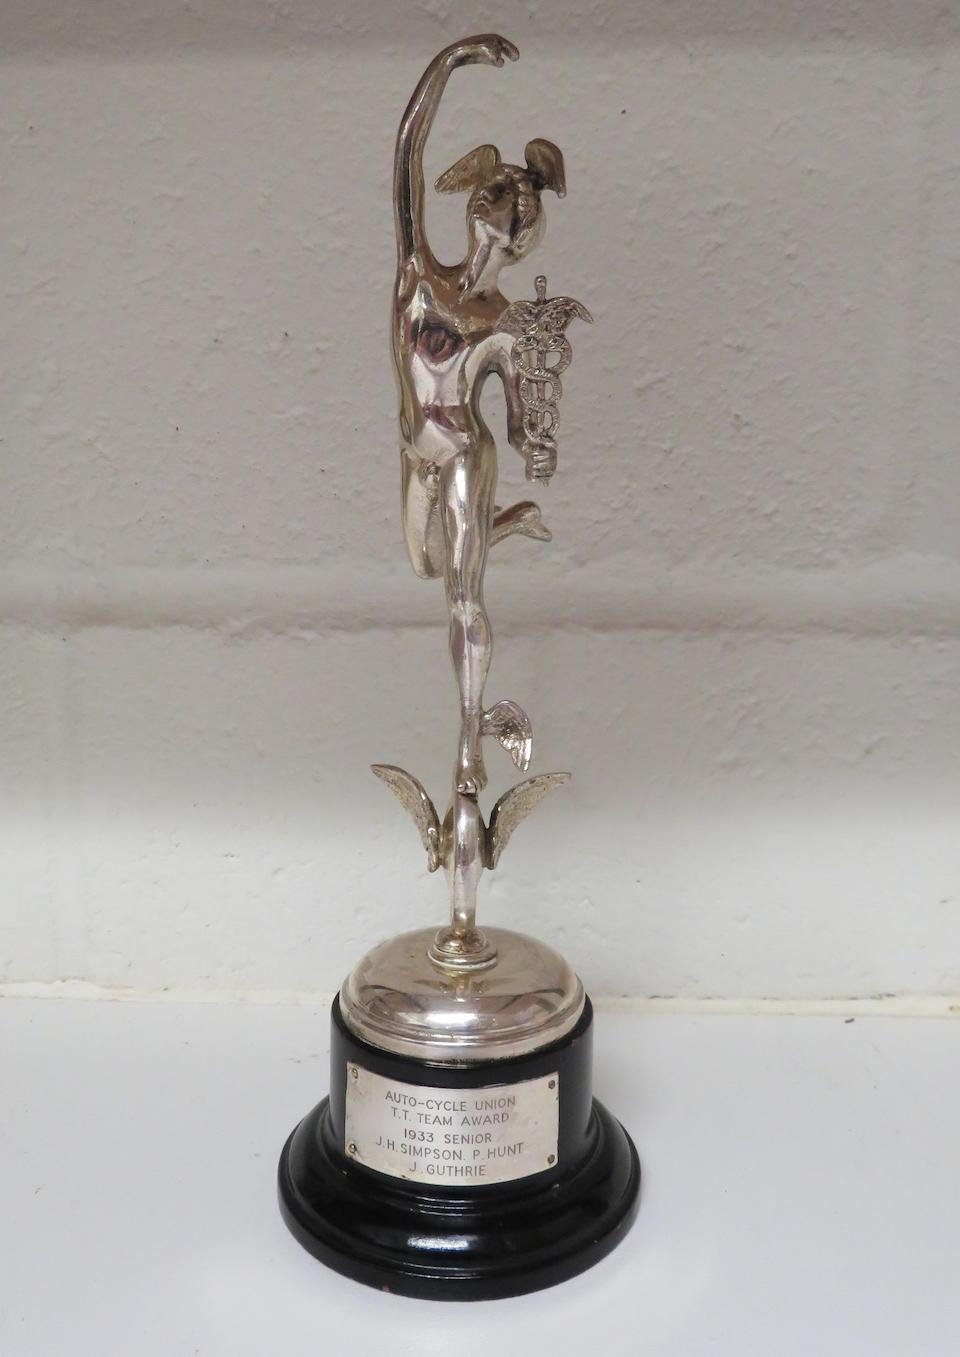 An Isle of Man TT Silver Replica Trophy, 1933 Senior T.T. Team Award